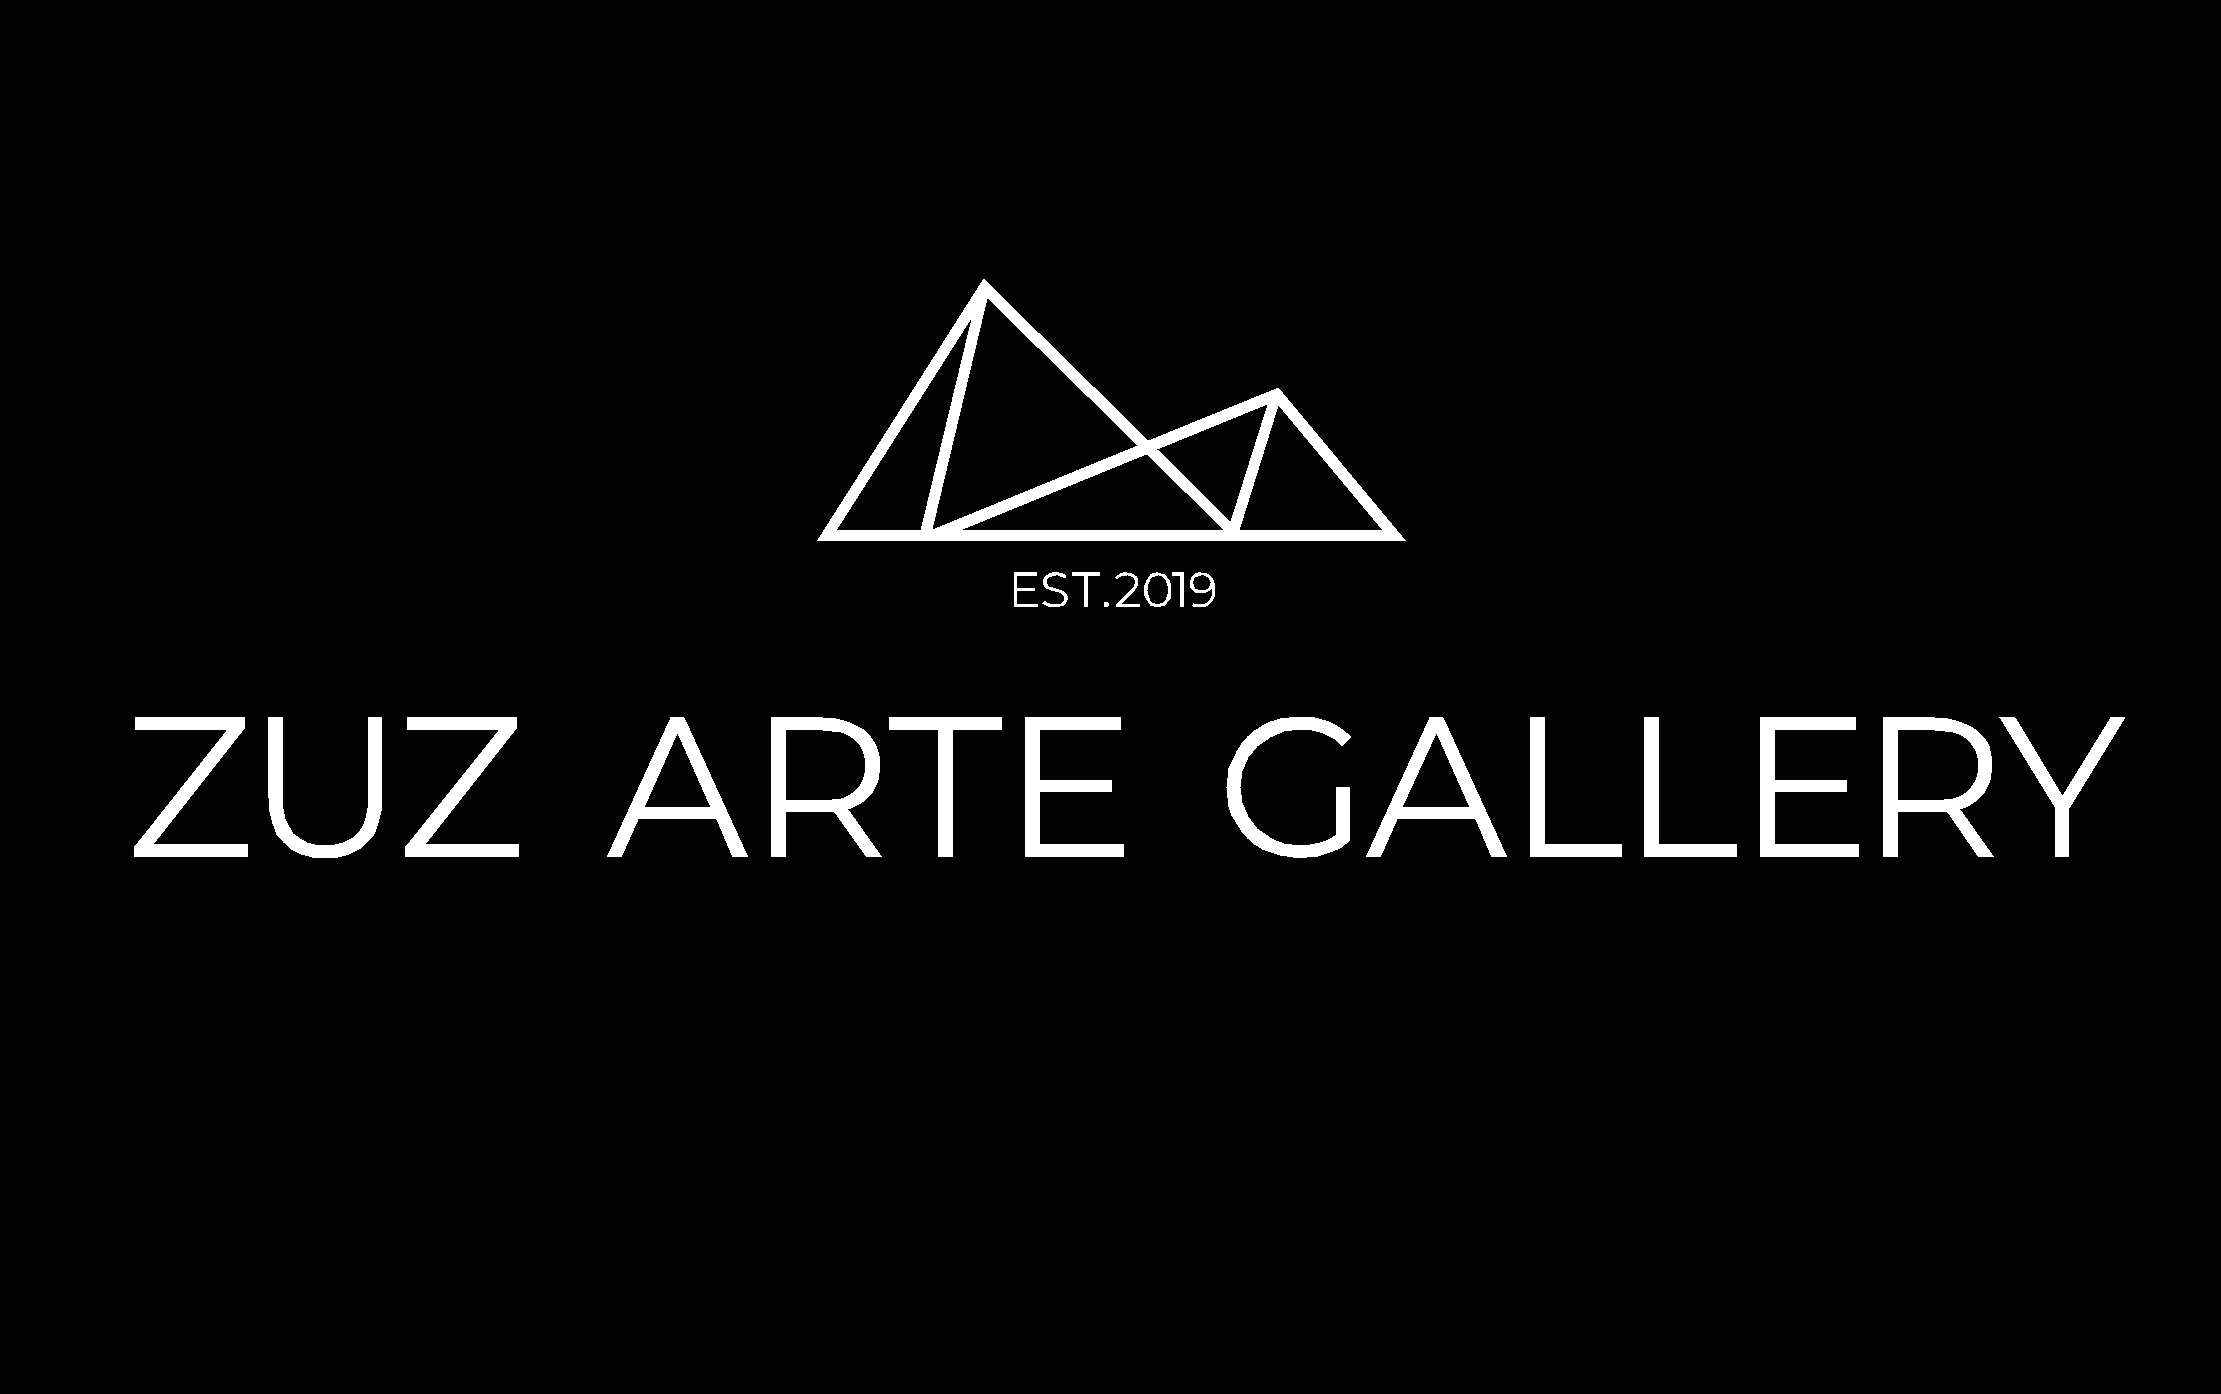 Zuz Arte Gallery